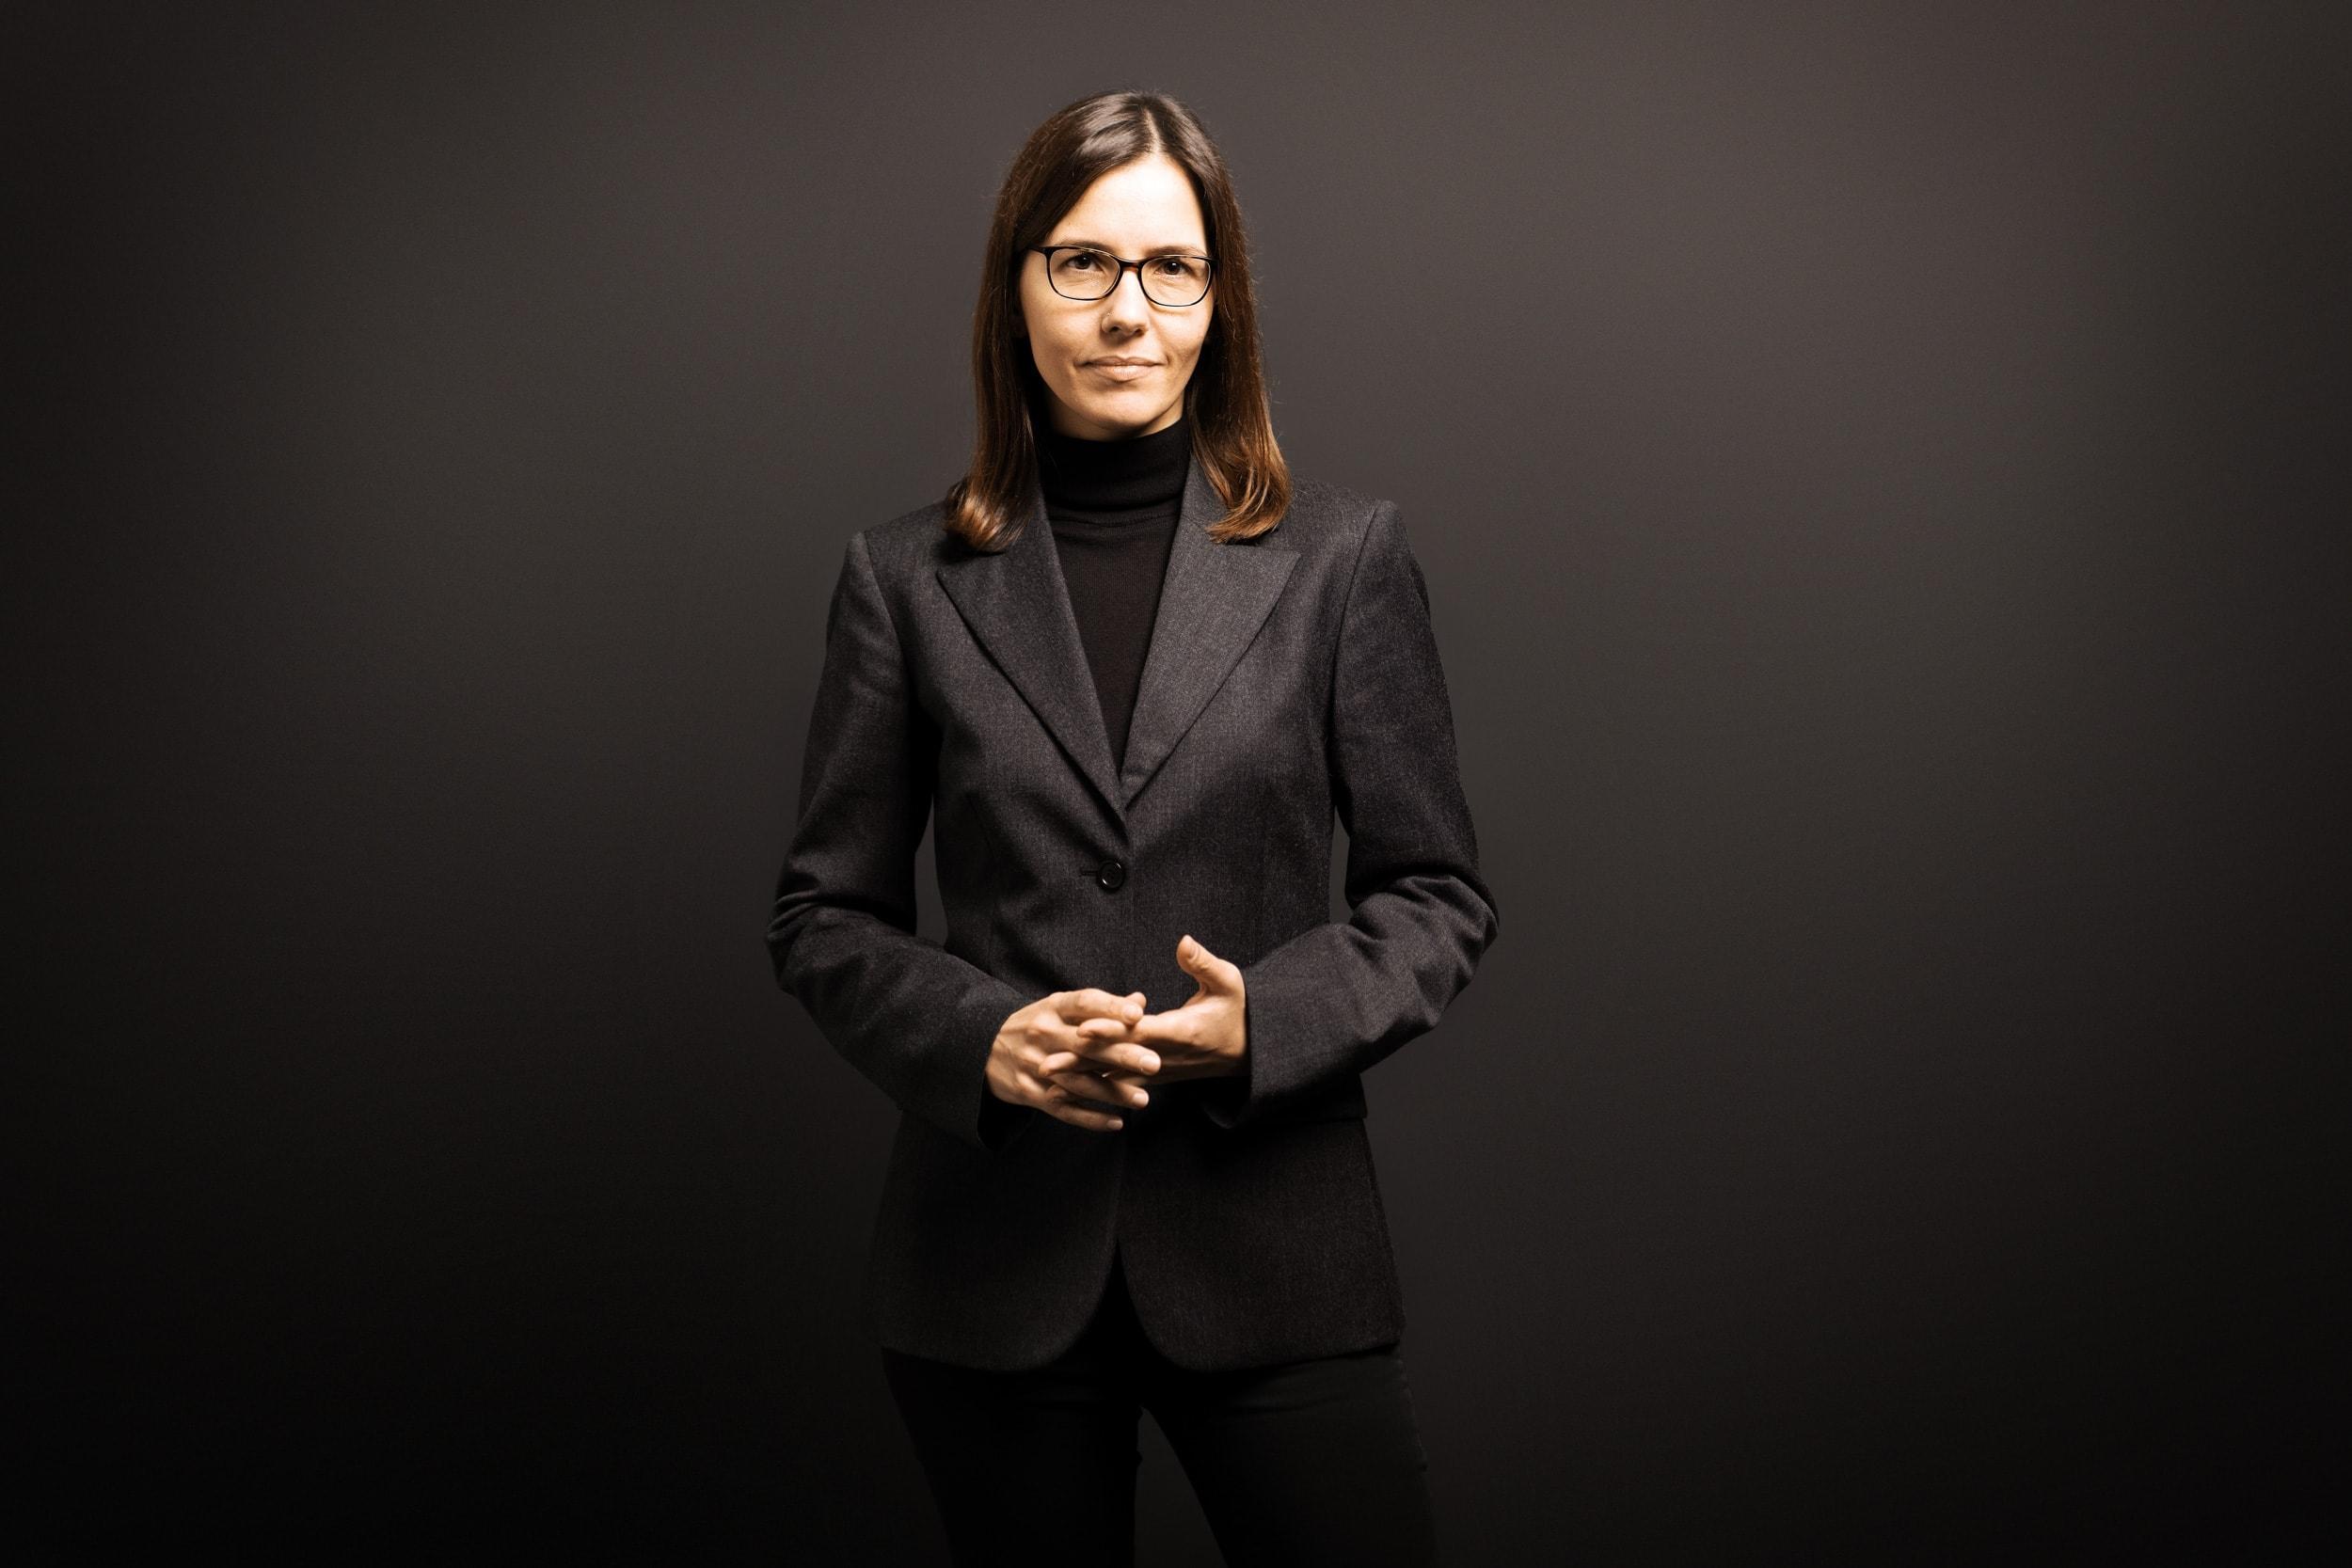 Nadia Bendinelli